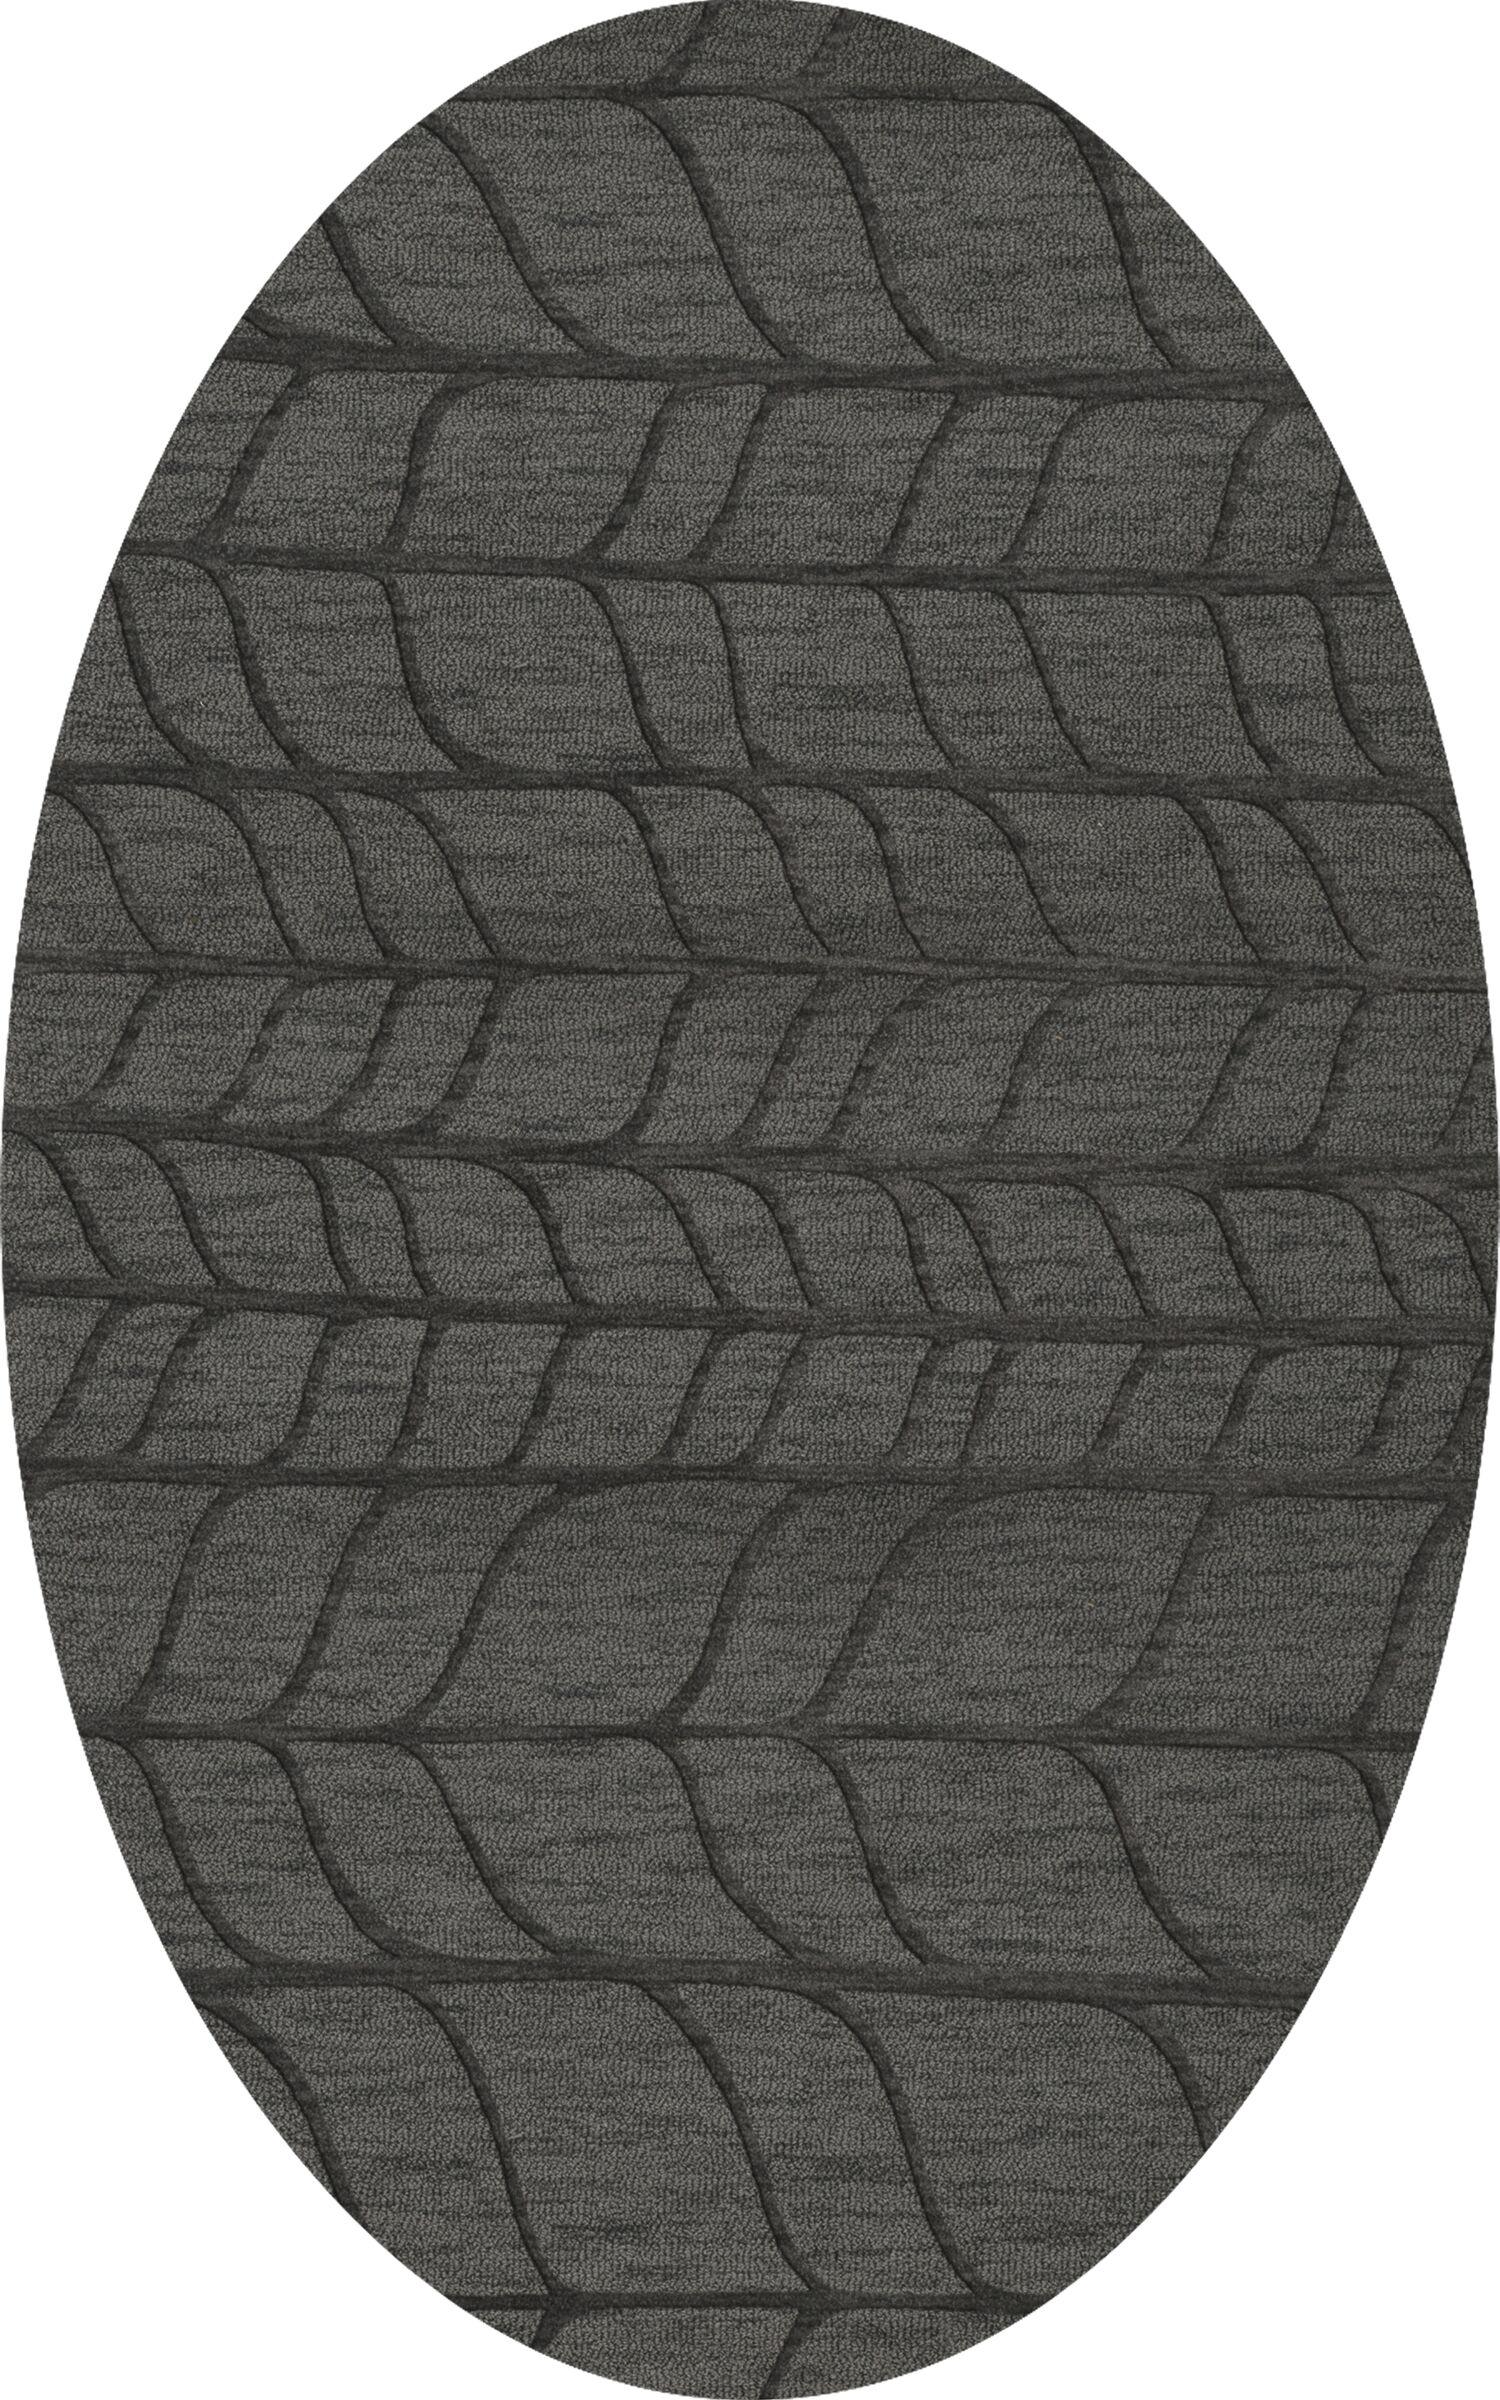 Bella Machine Woven Wool Gray Area Rug Rug Size: Oval 6' x 9'